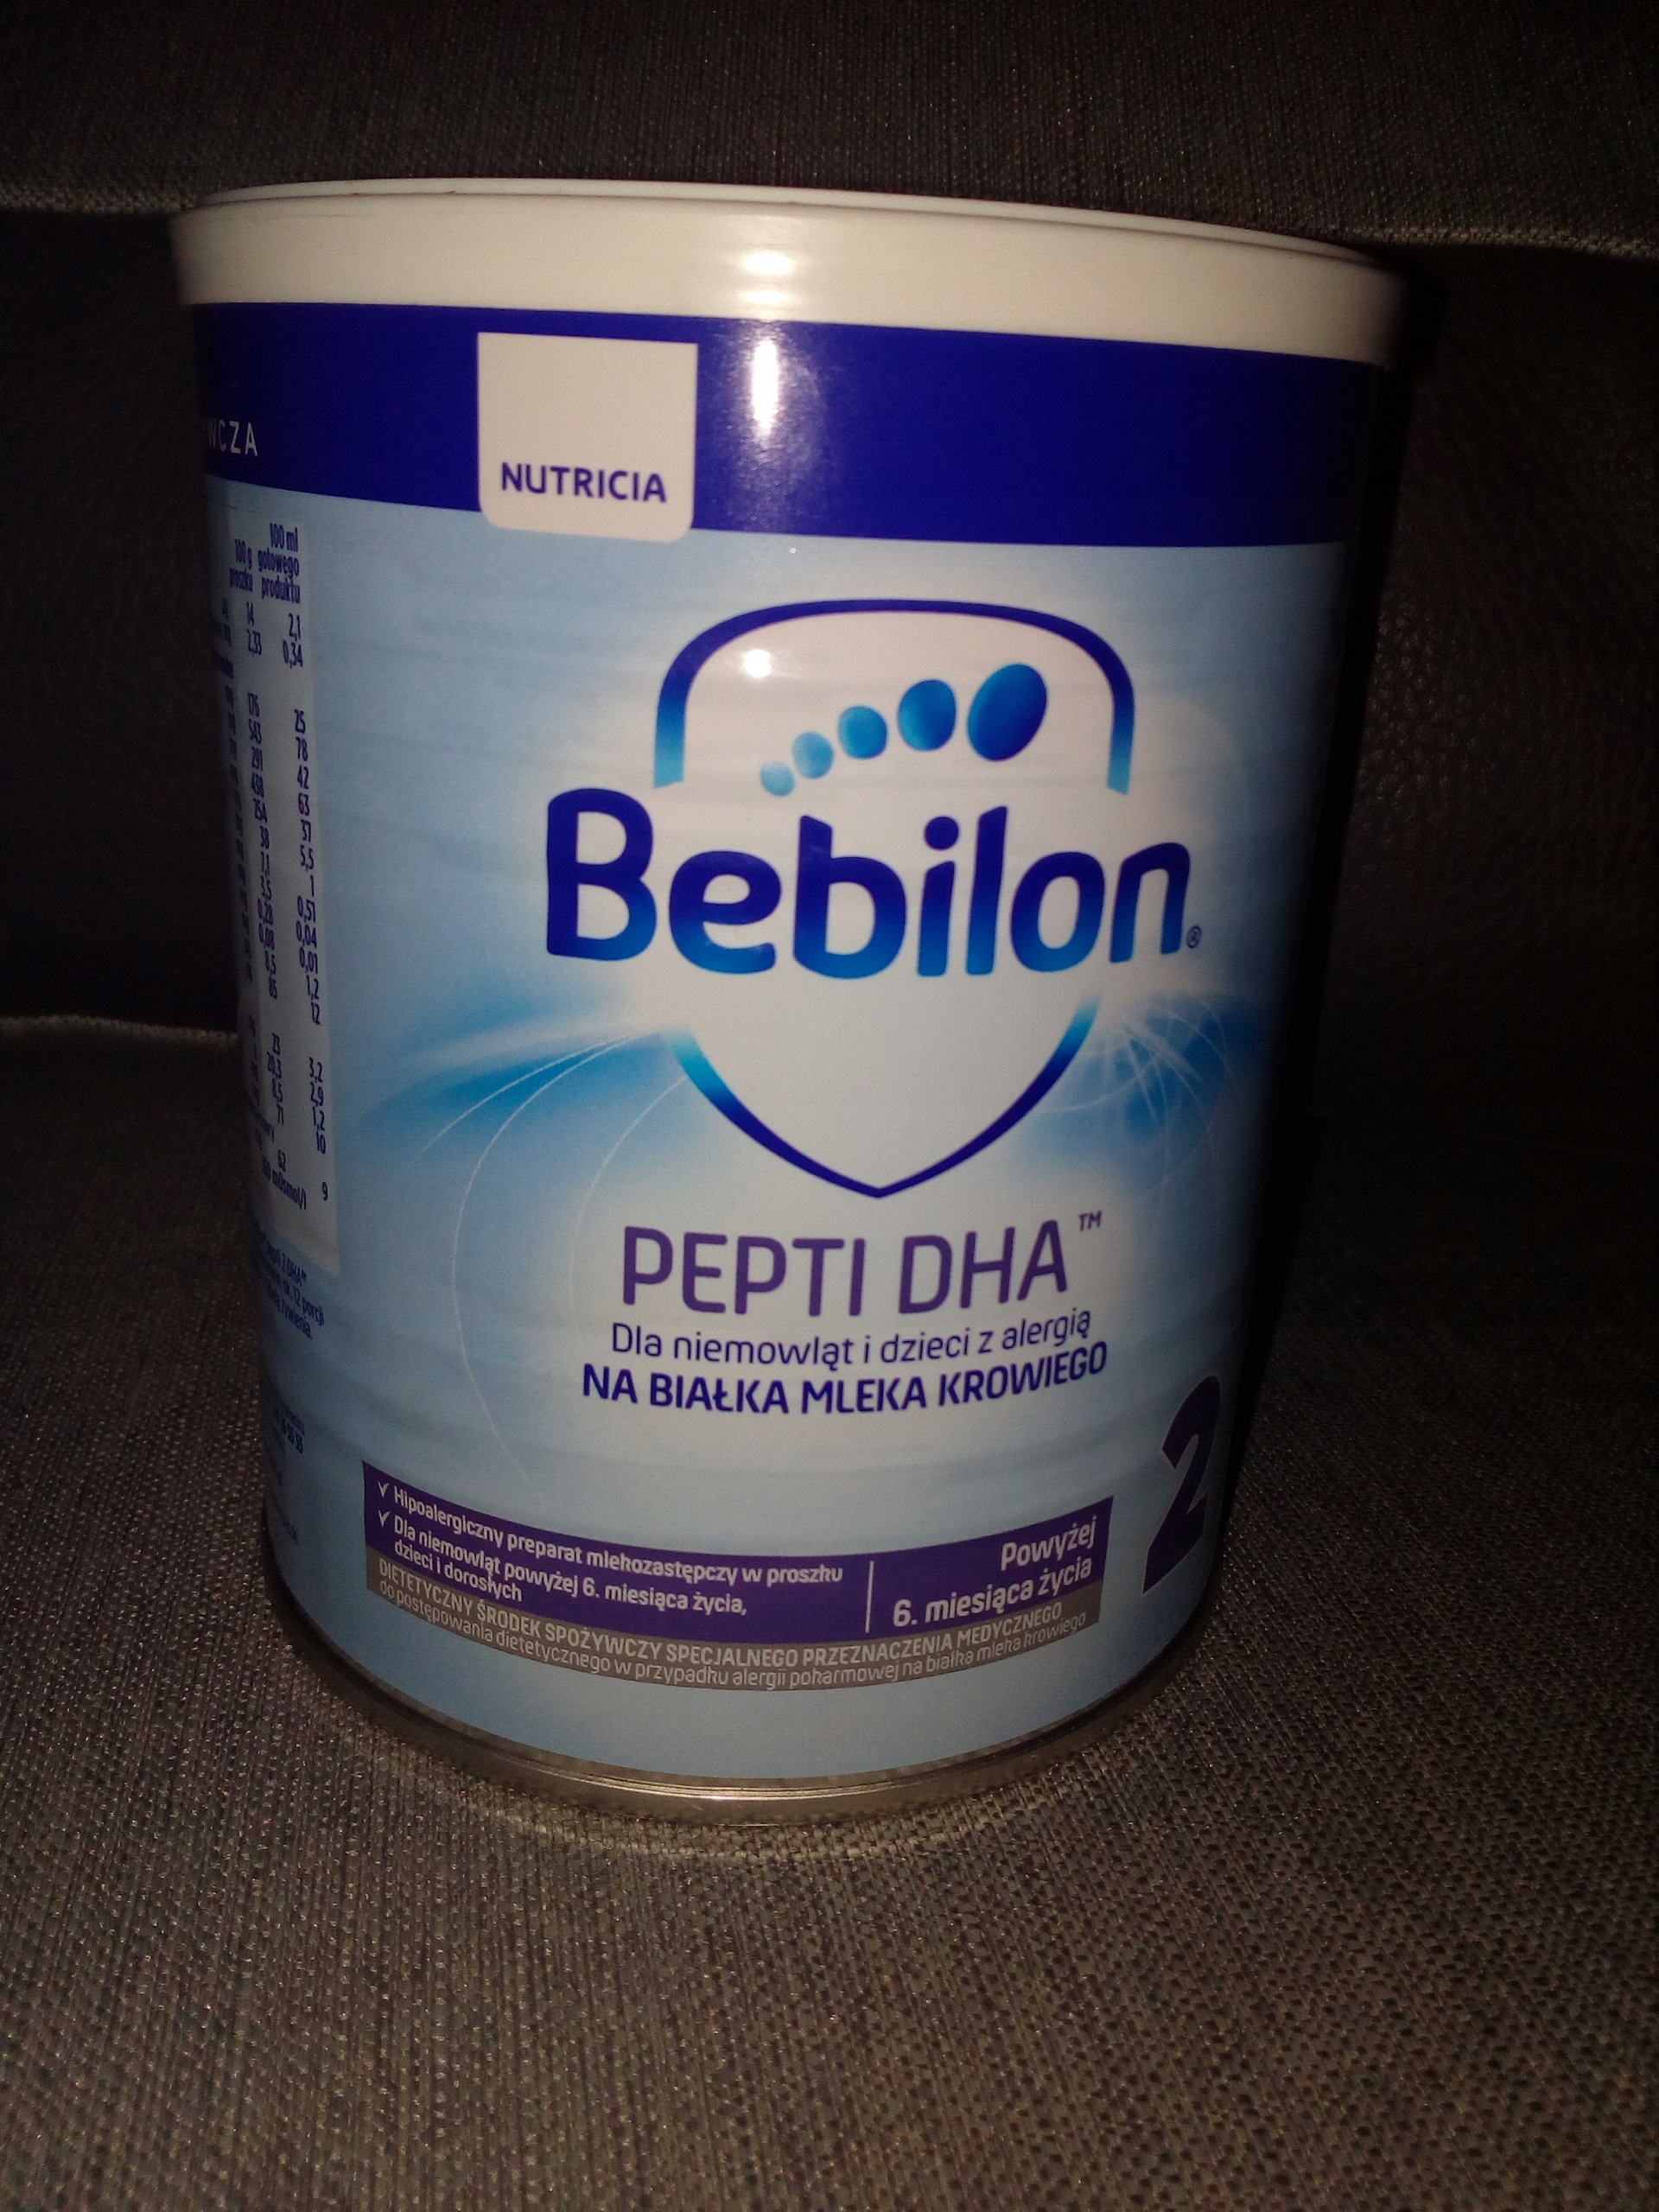 mleko bebilon pepti dha 2 400 g - alergia